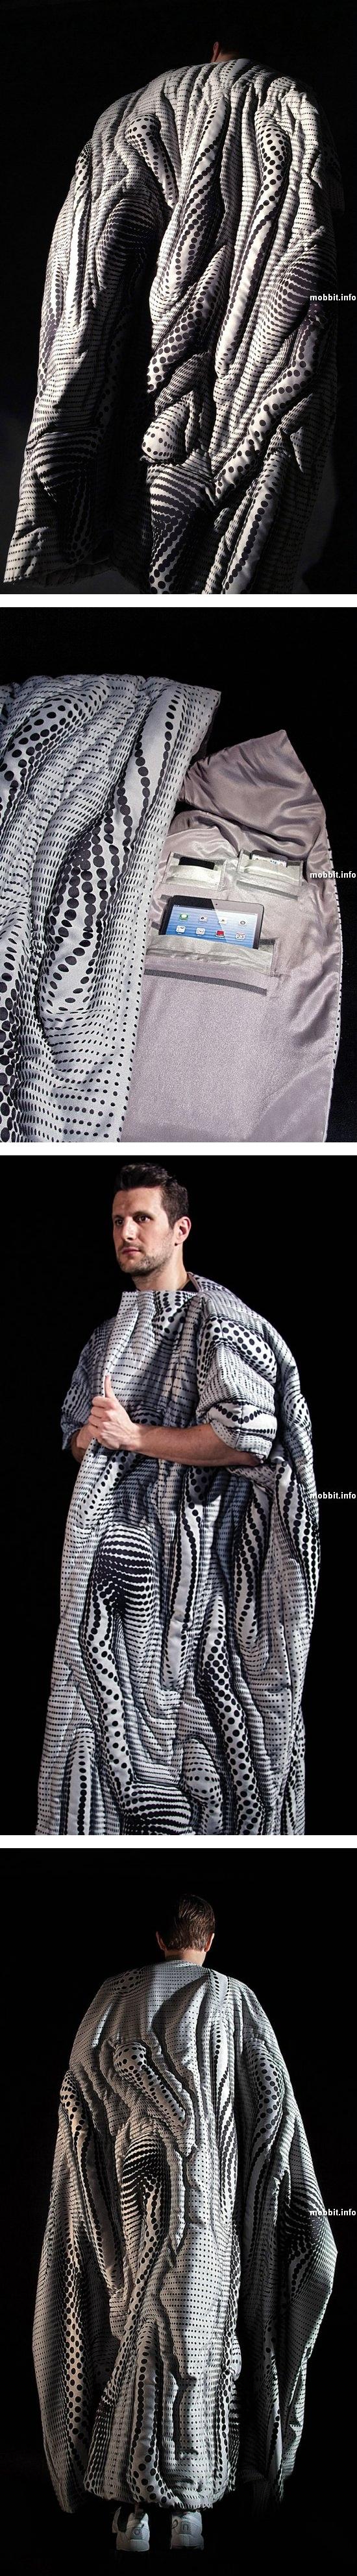 CHBL Jammer Coat